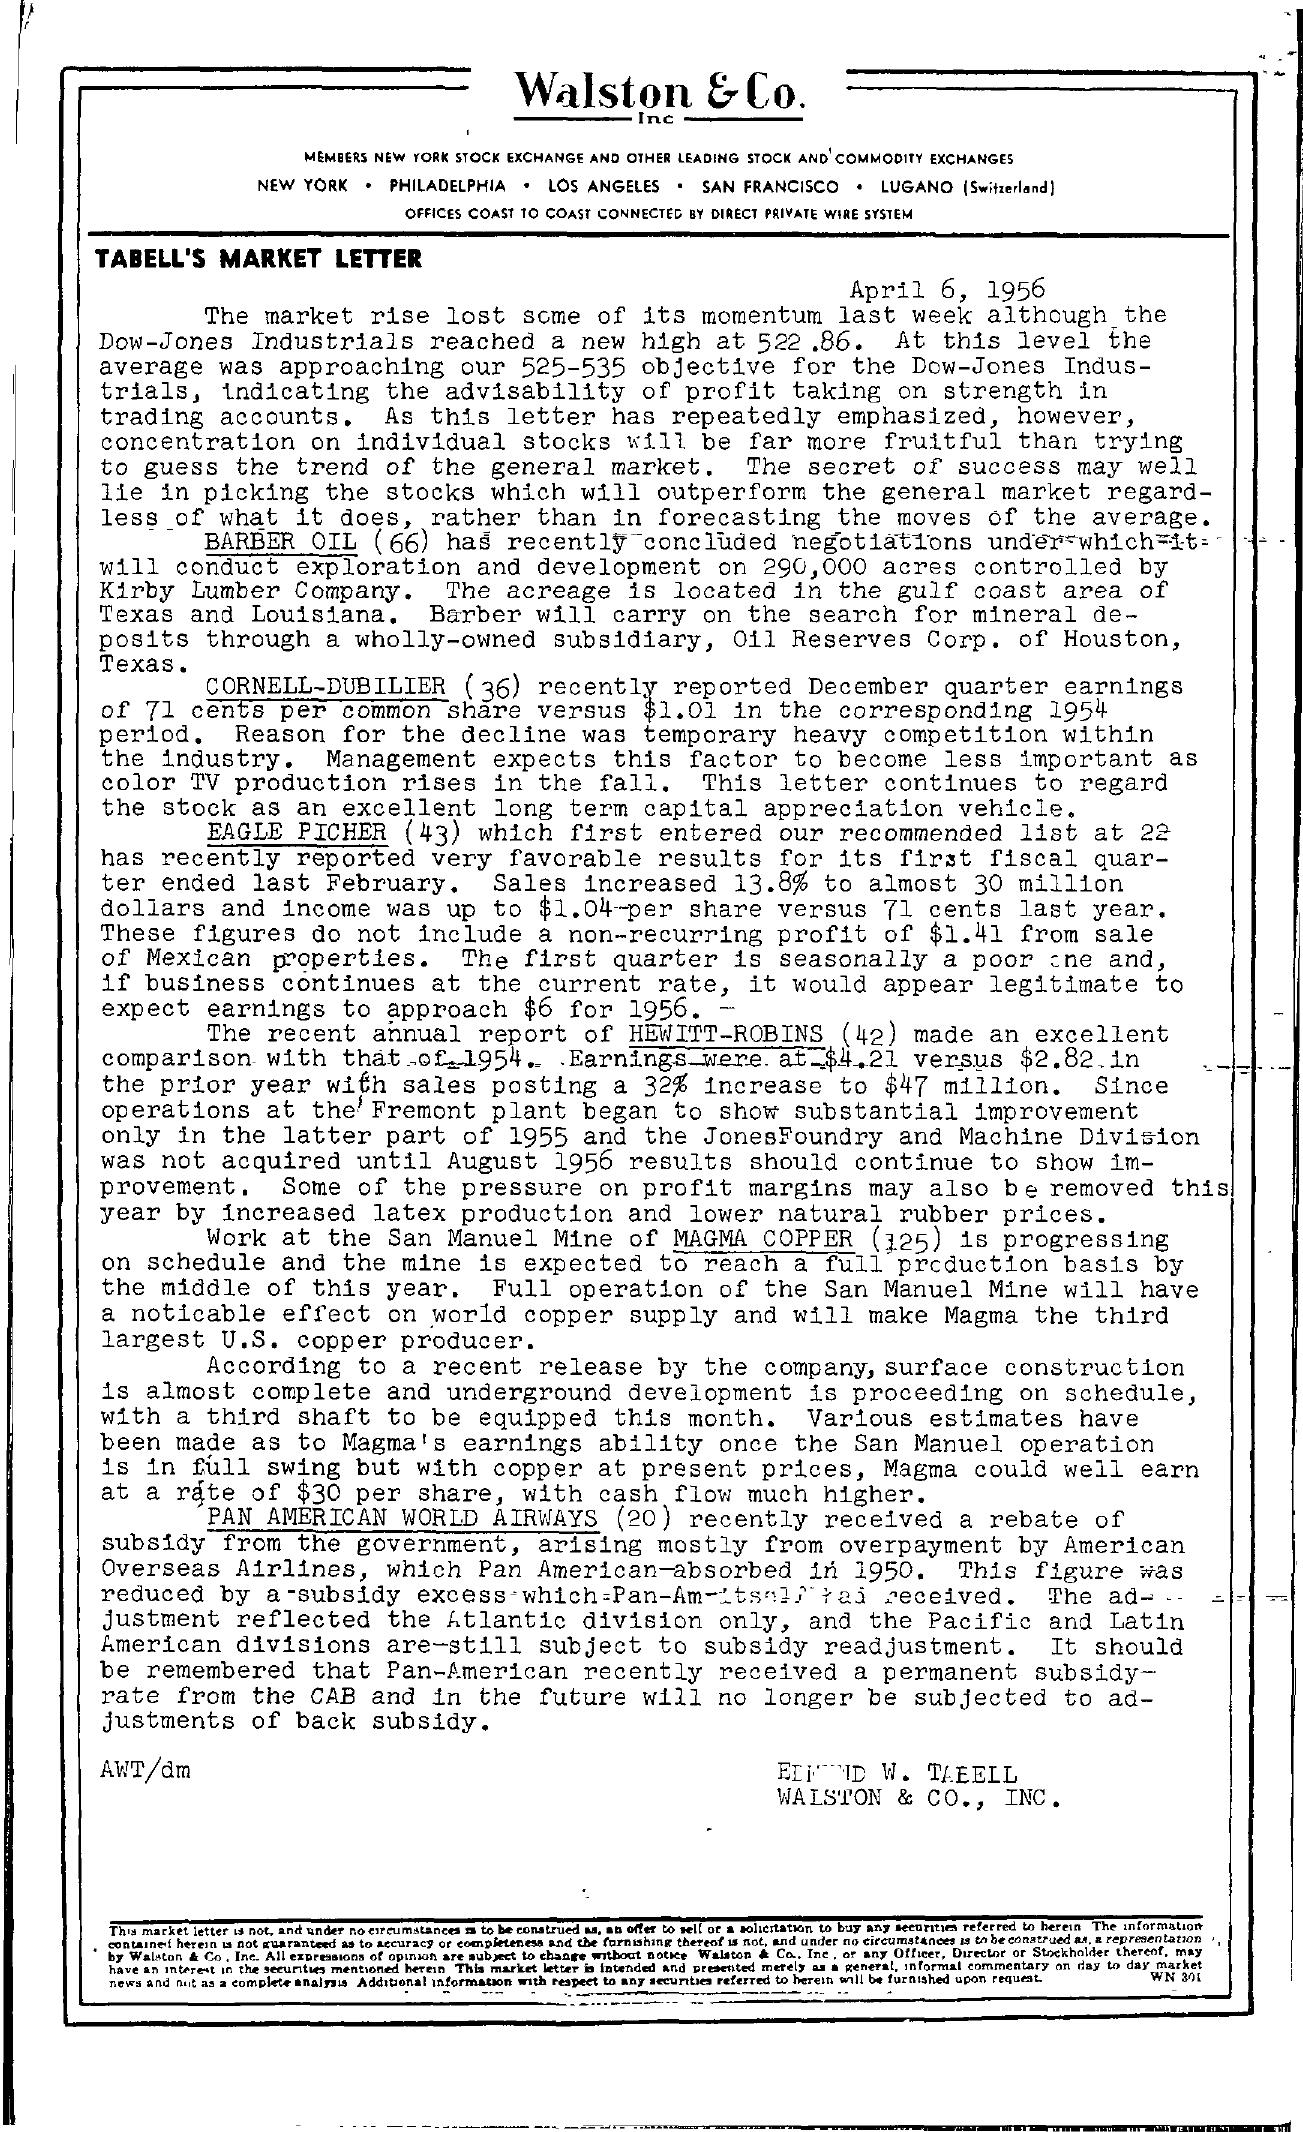 Tabell's Market Letter - April 06, 1956